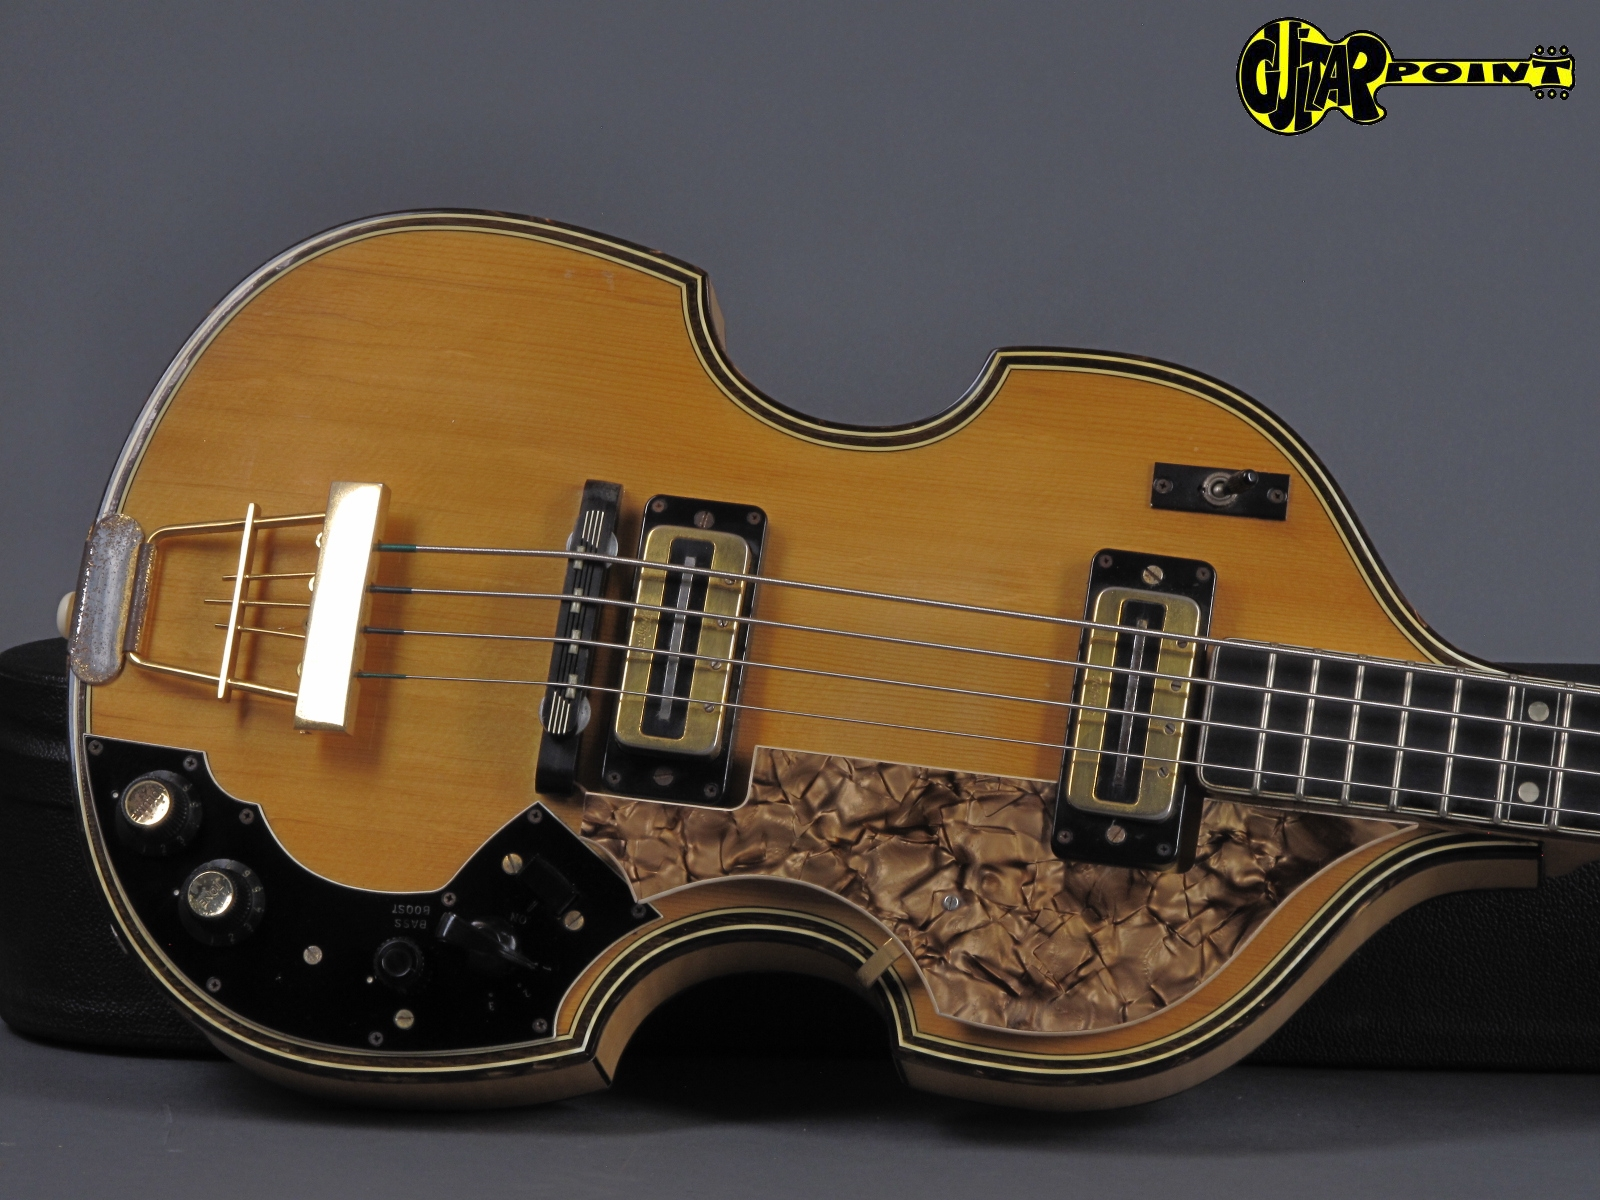 https://guitarpoint.de/app/uploads/products/1972-hoefner-5000-1b-super-beatles-bass-natural/Hofner72_5000B_19.jpg